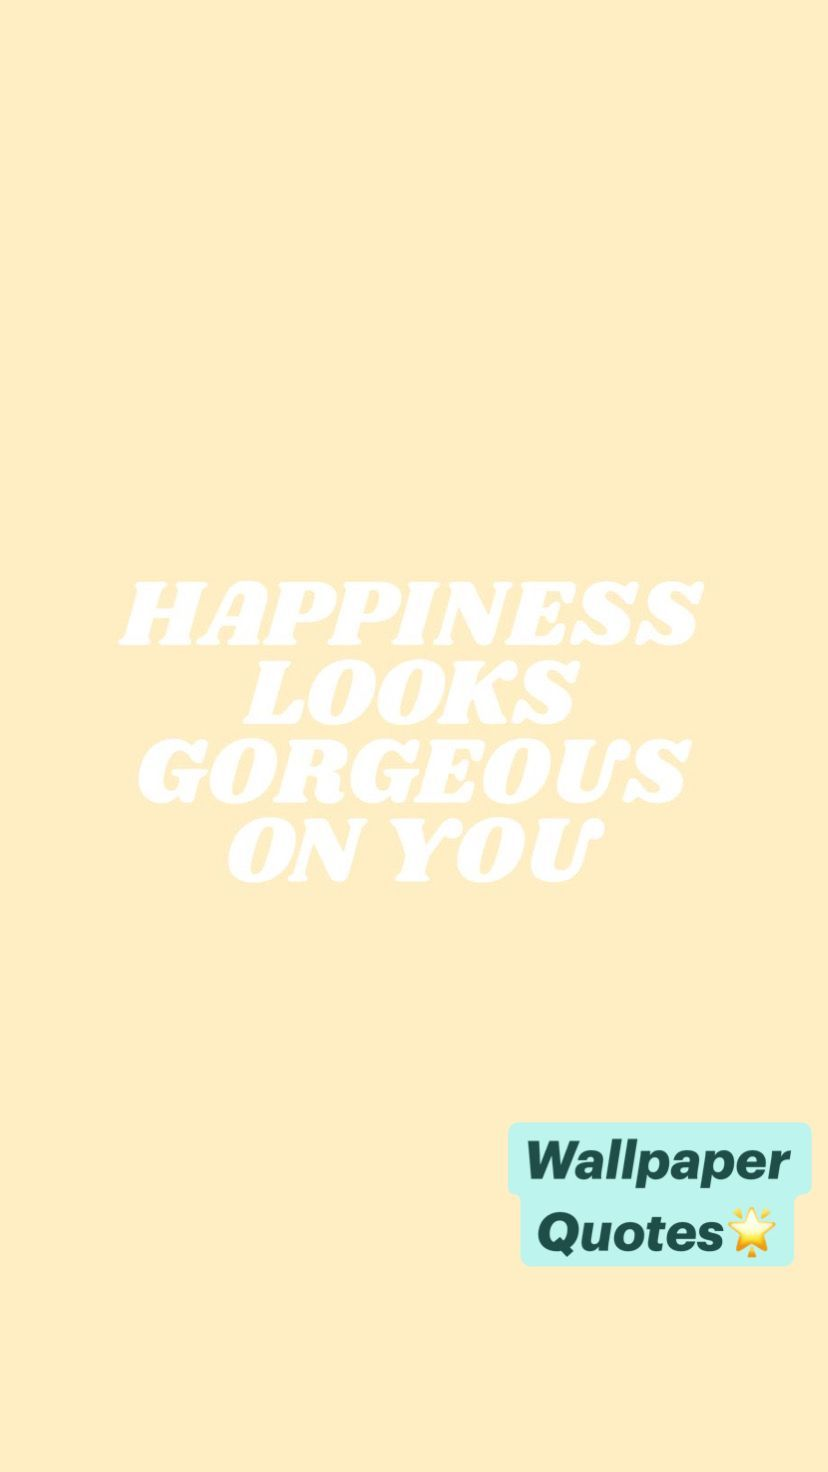 Wallpaper Quotes������